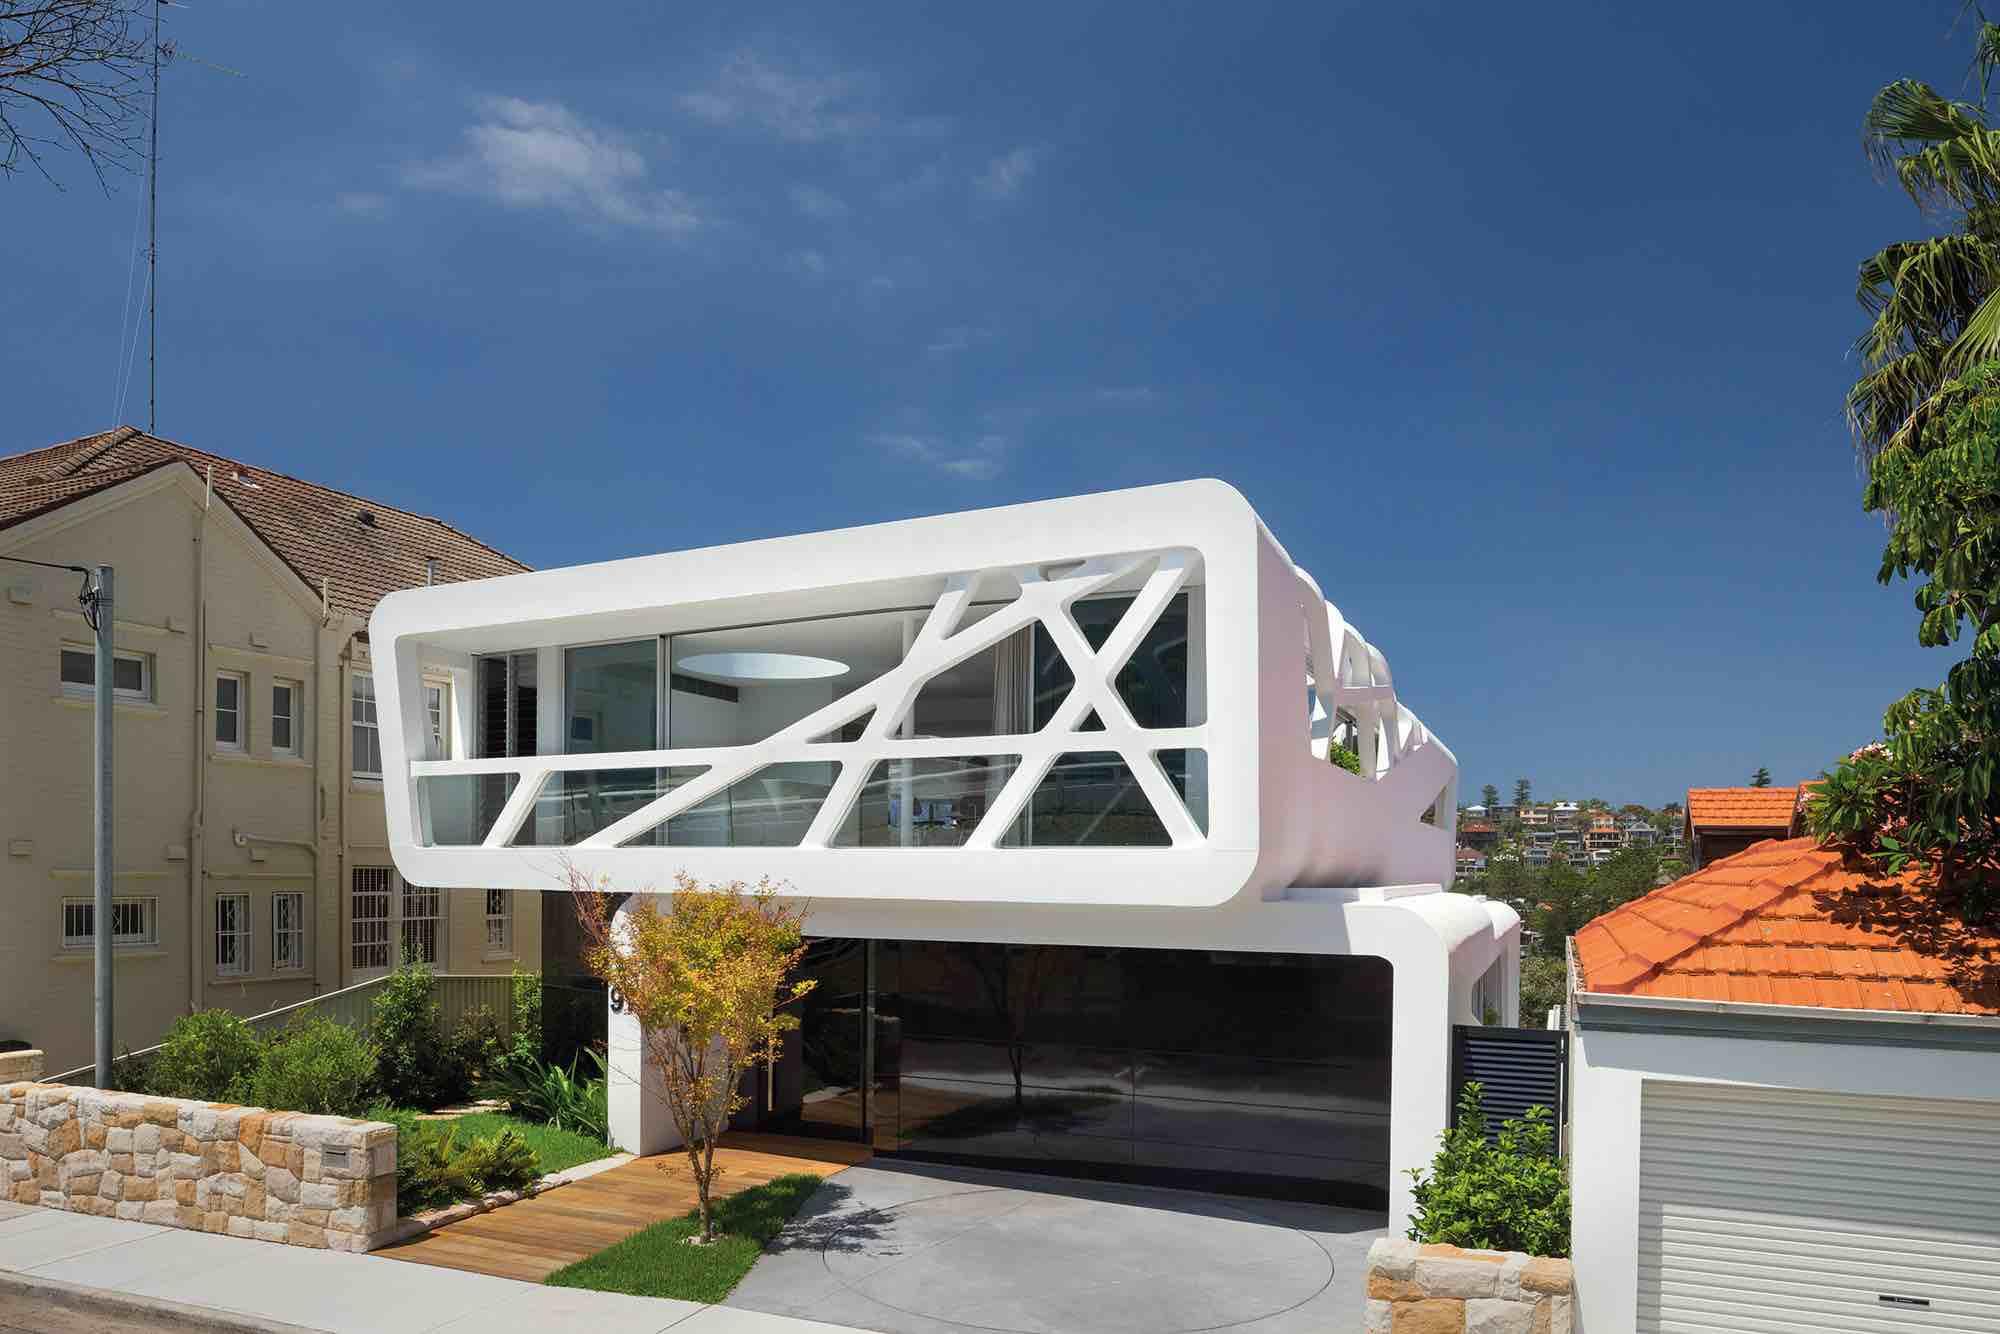 hewlett-street-house-mpr-design-group_hewlett_house26